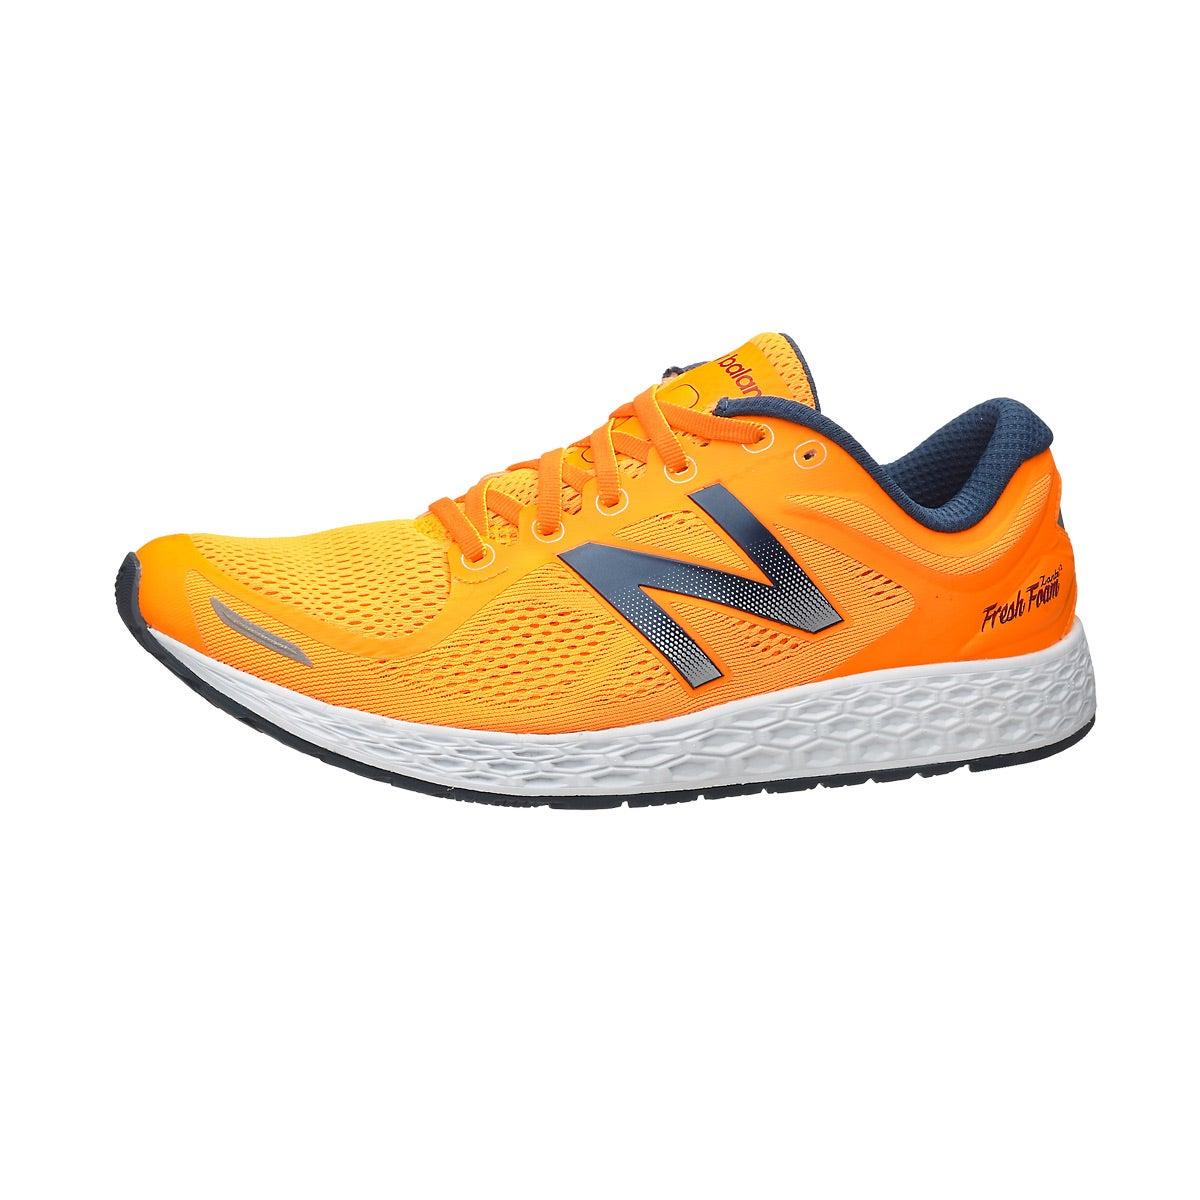 new balance 1500v2 running warehouse nz